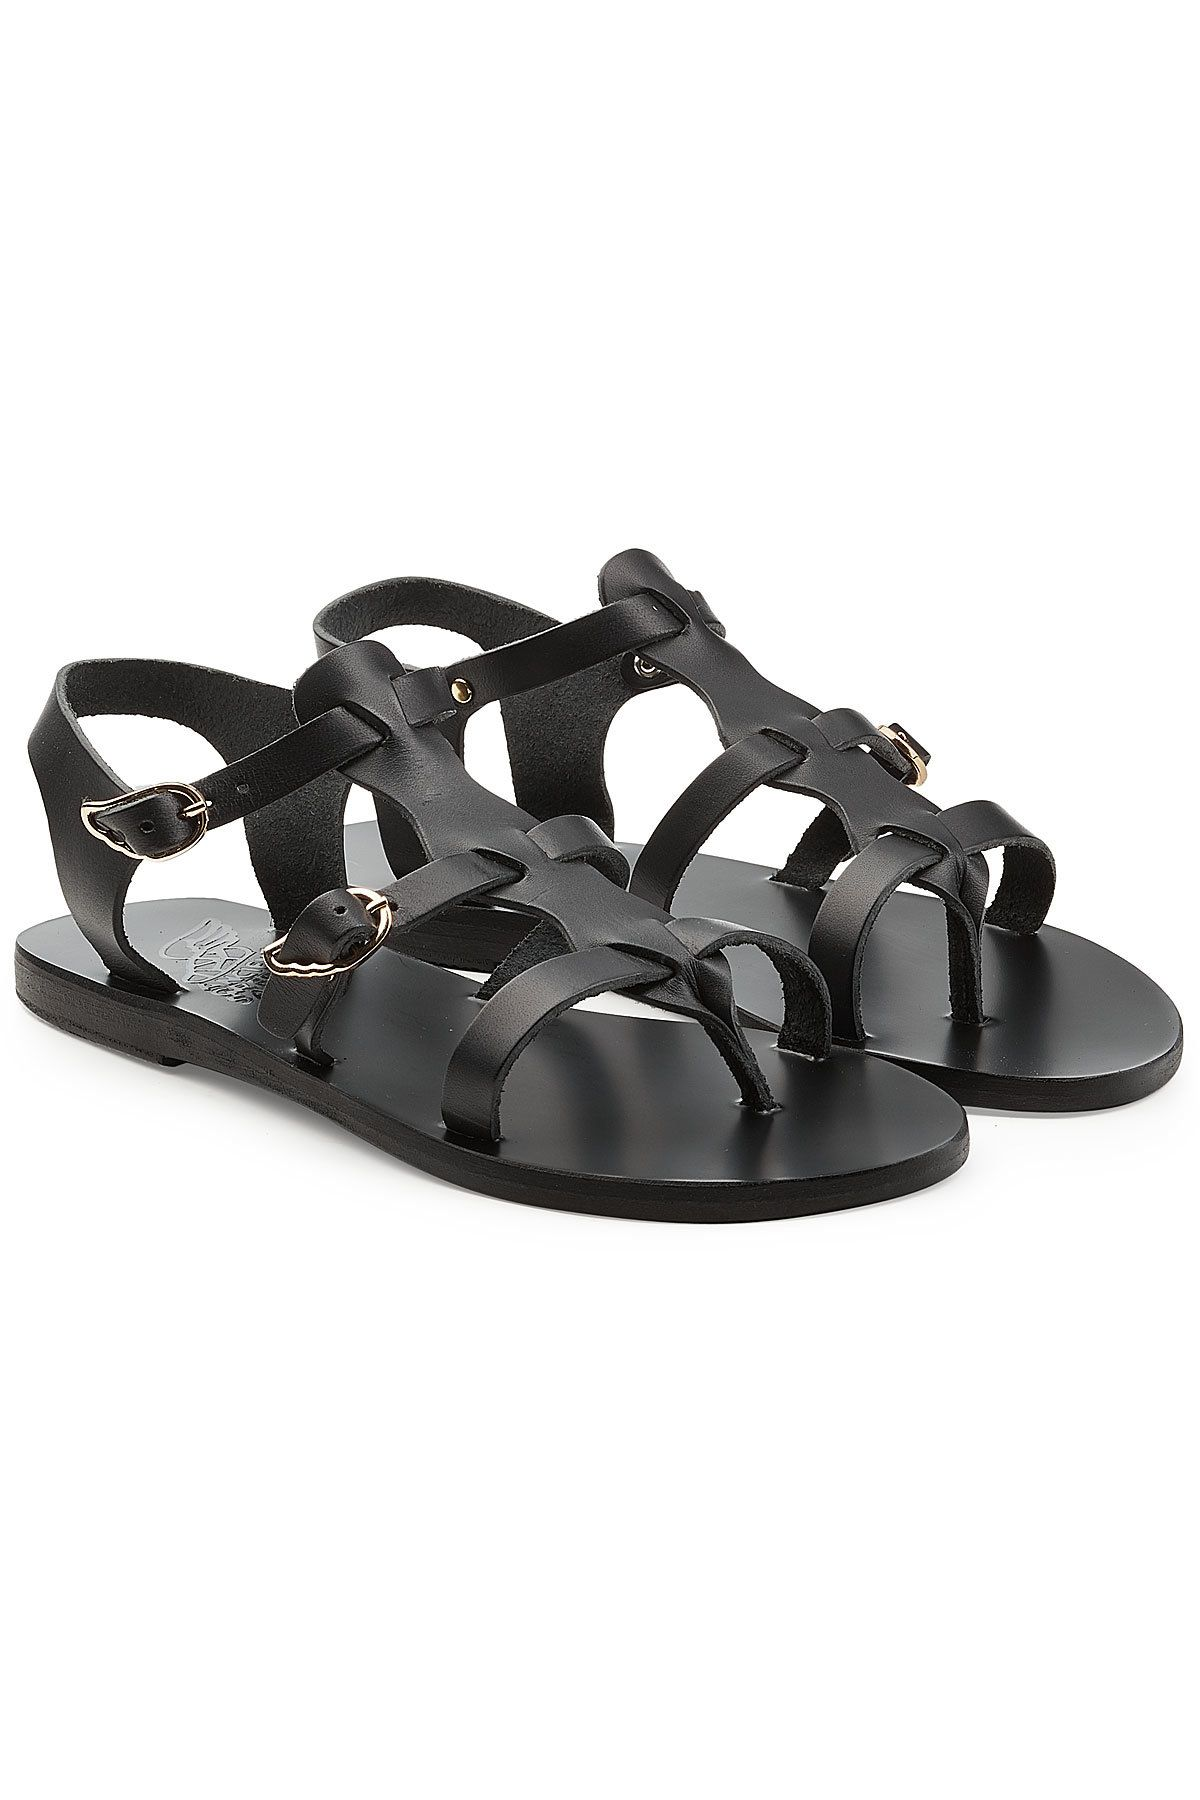 05a02b986 Ancient Greek Sandals Grace Kelly Leather Sandals